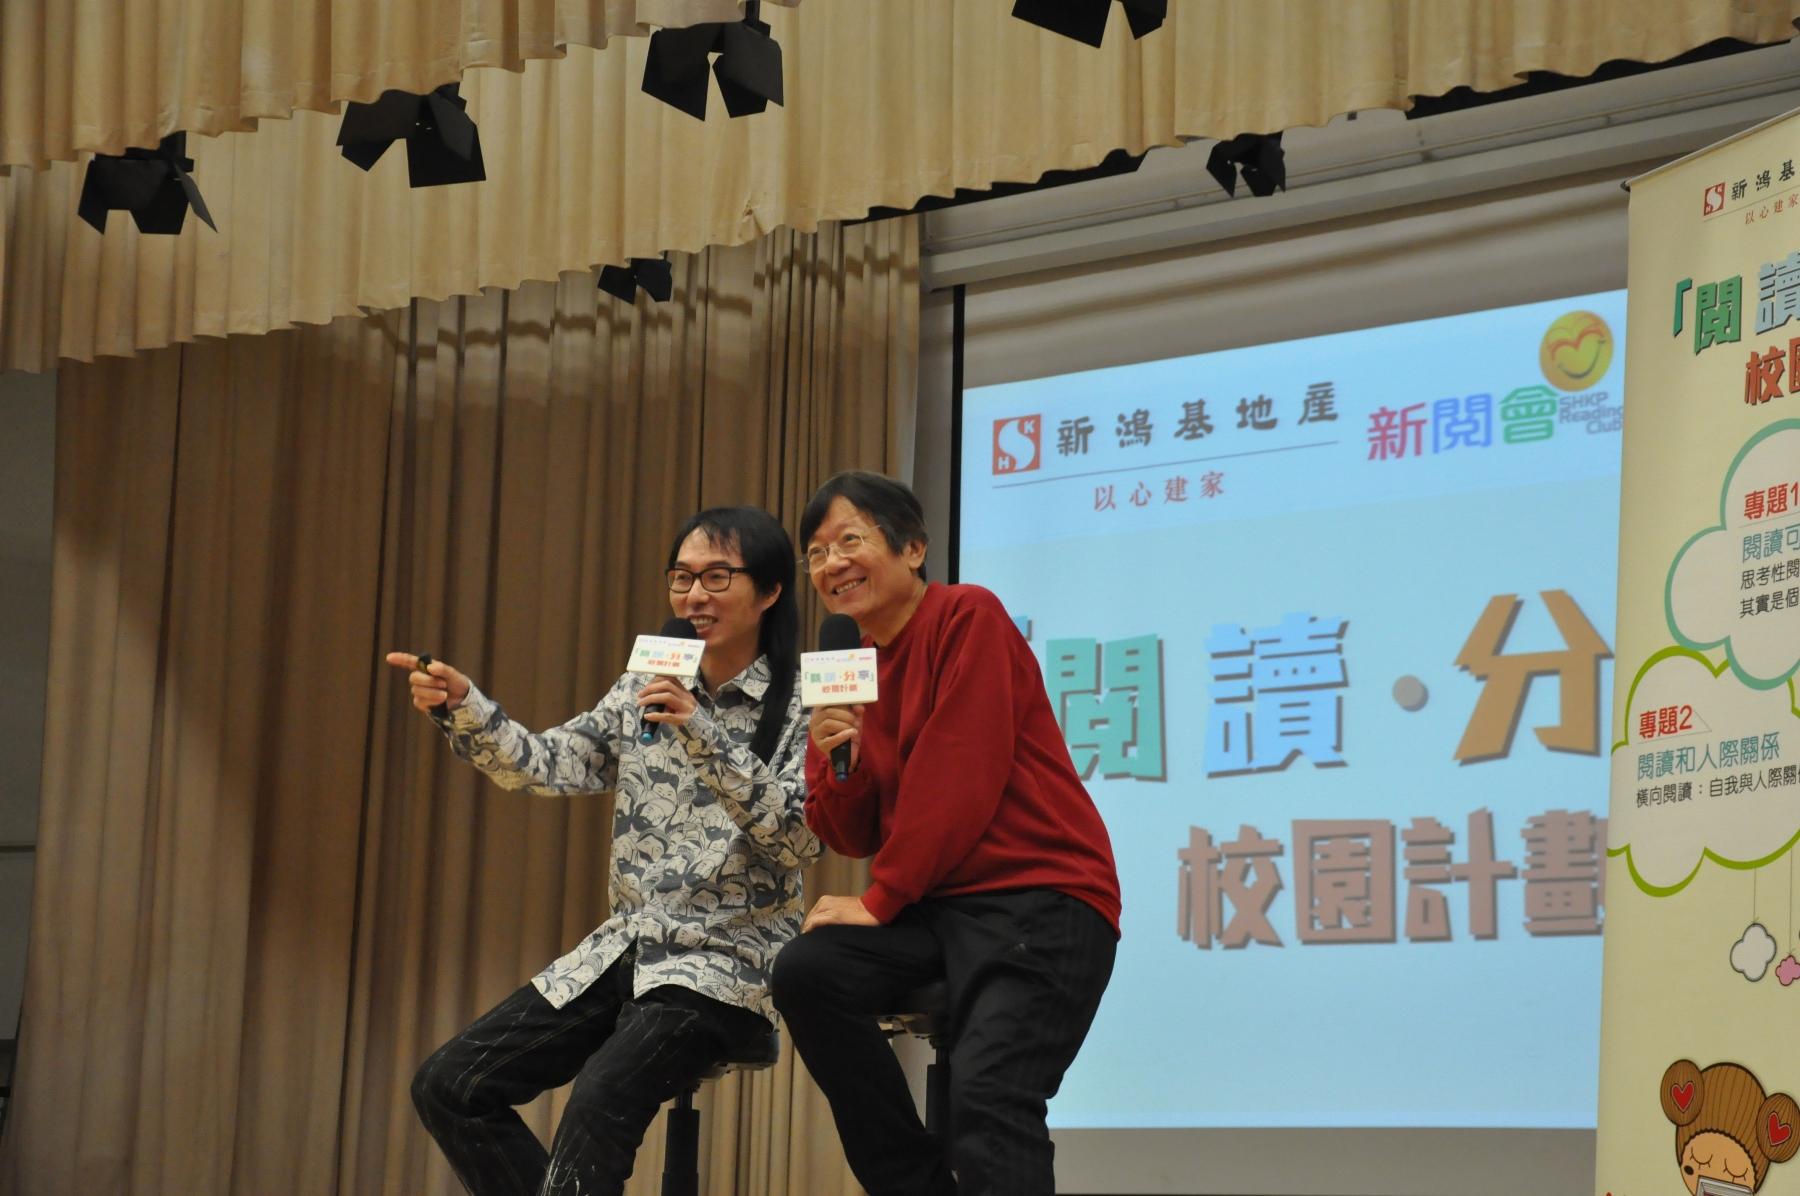 http://www.npc.edu.hk/sites/default/files/dsc_0009_1.jpg